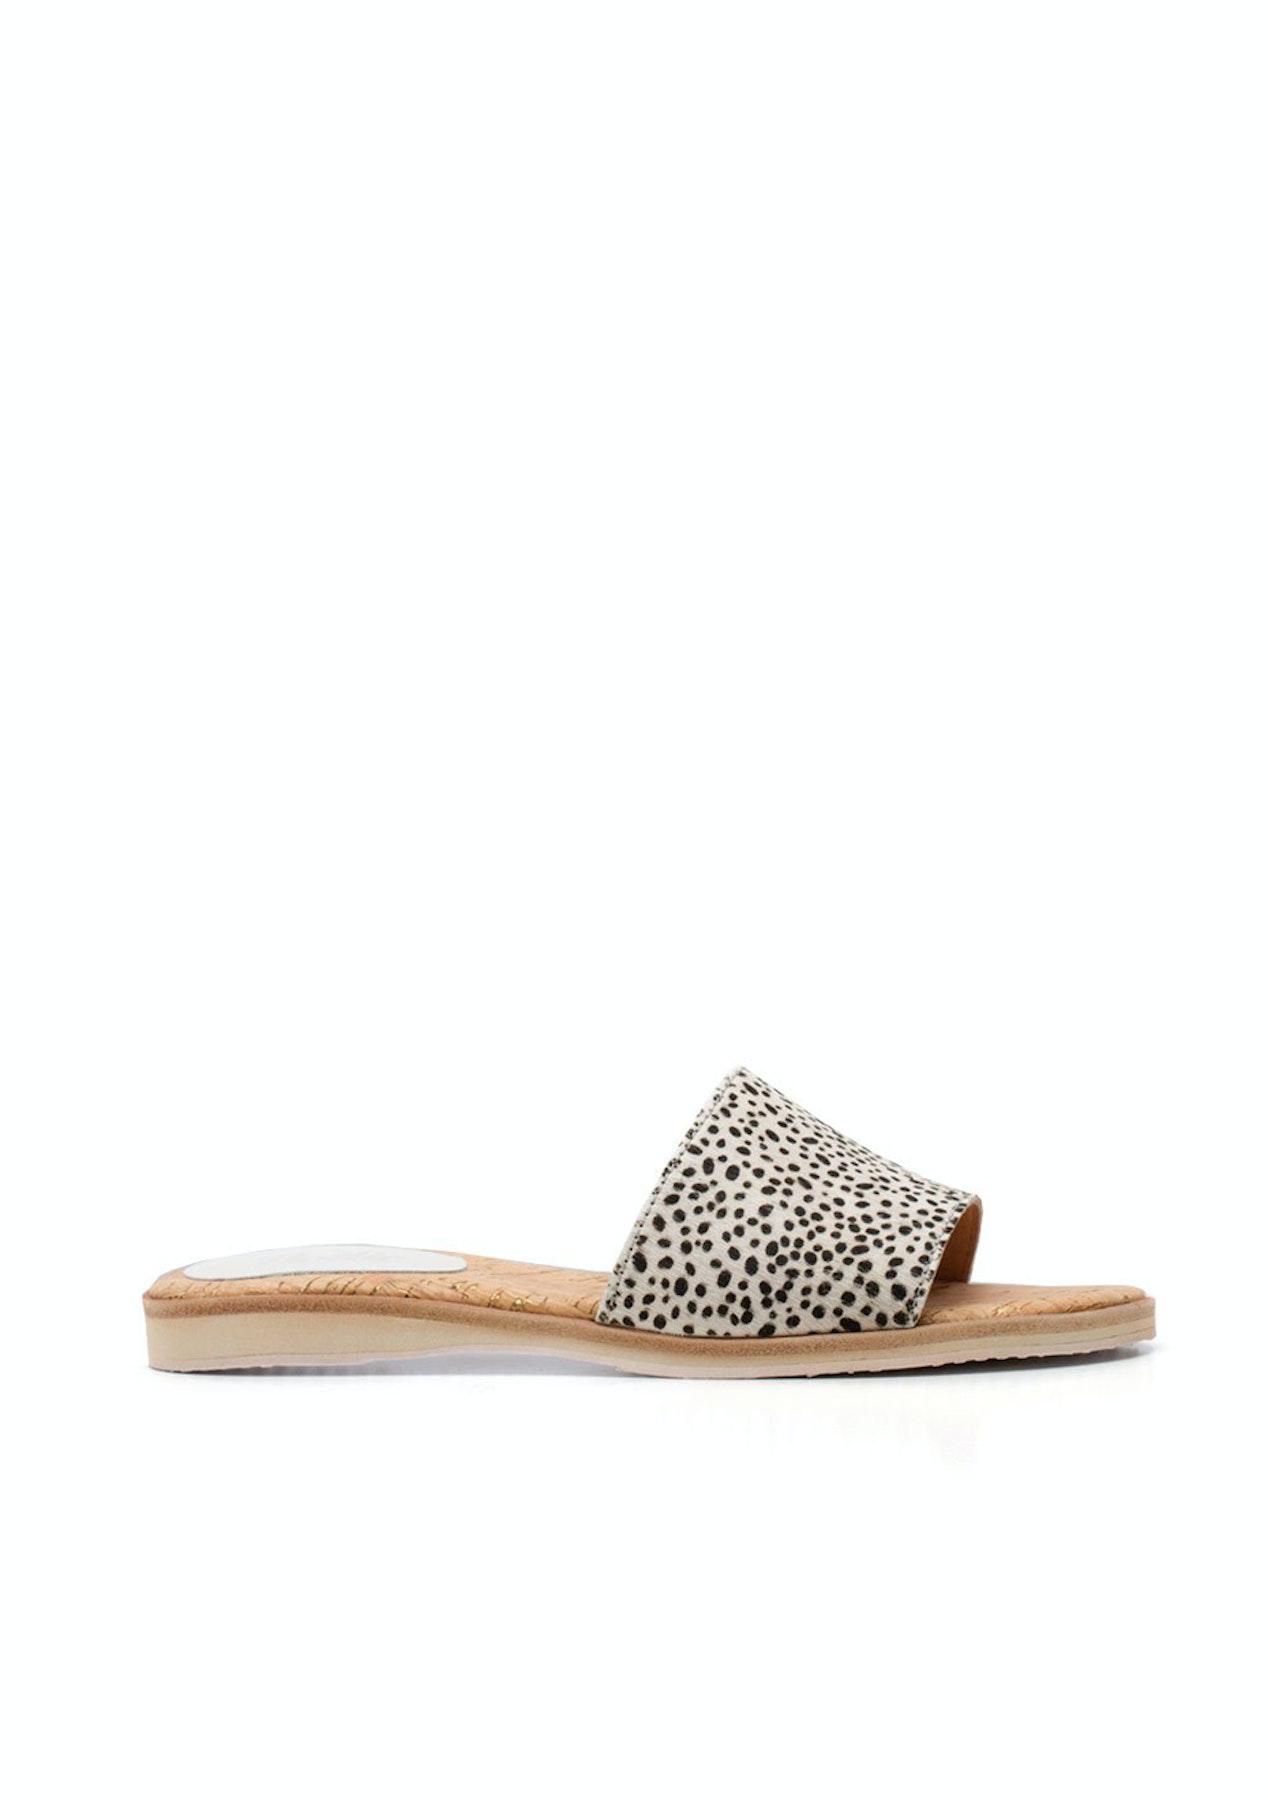 85e5b5572ff6c Rollie - Sandal Slide - Snow Leopard - Mollini   More Free Shipping - Onceit